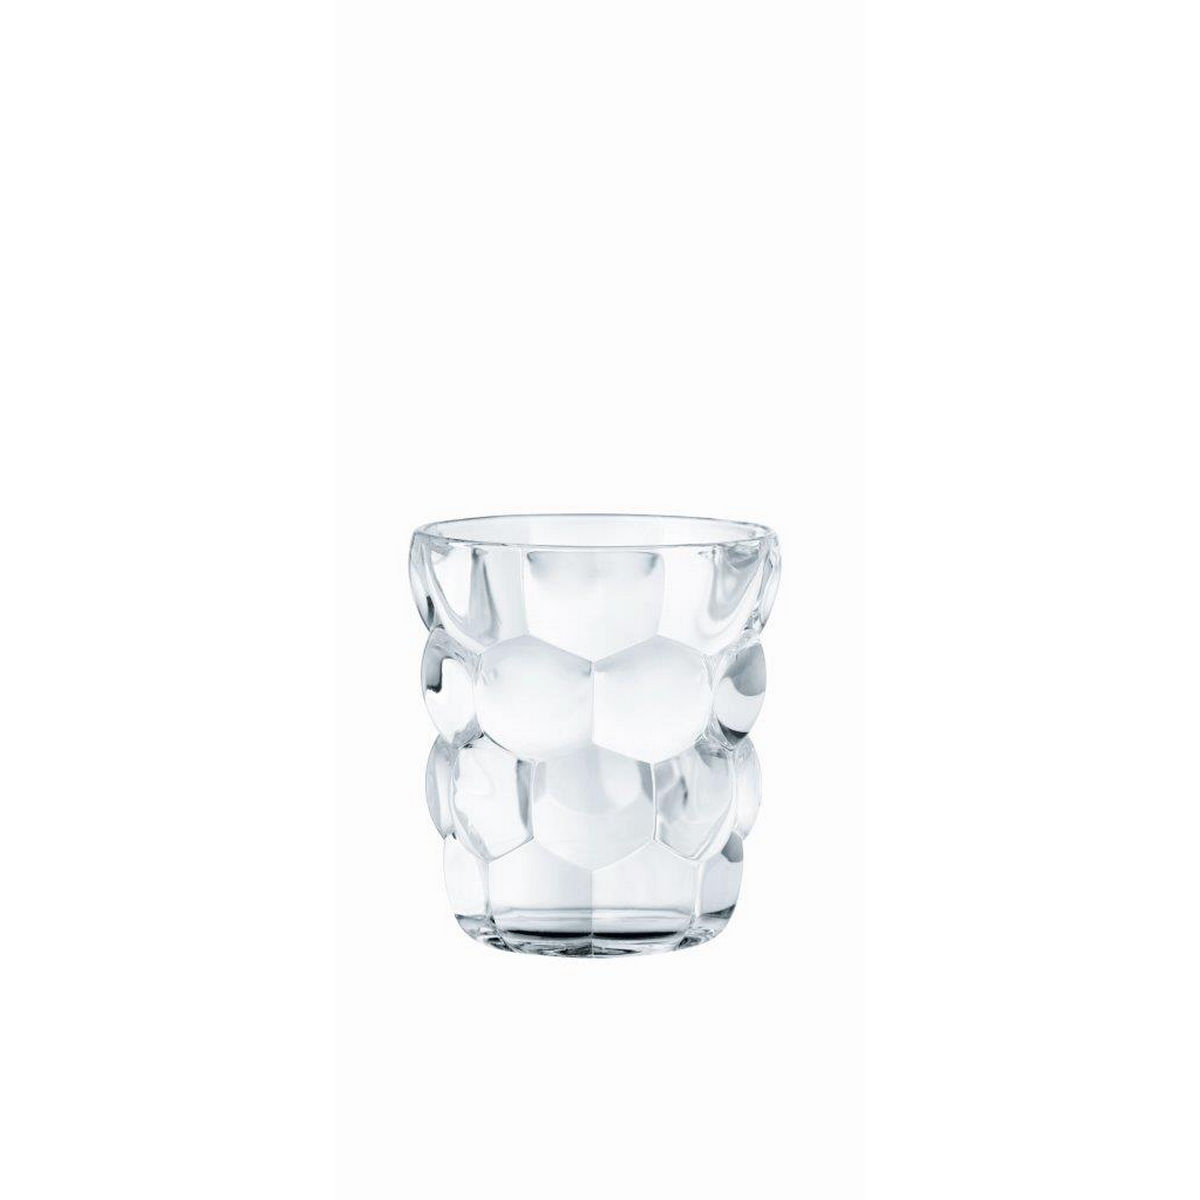 Bubbles Set 4 Pahare Cristalin Whisky 330 Ml 2021 aranjareamesei.ro